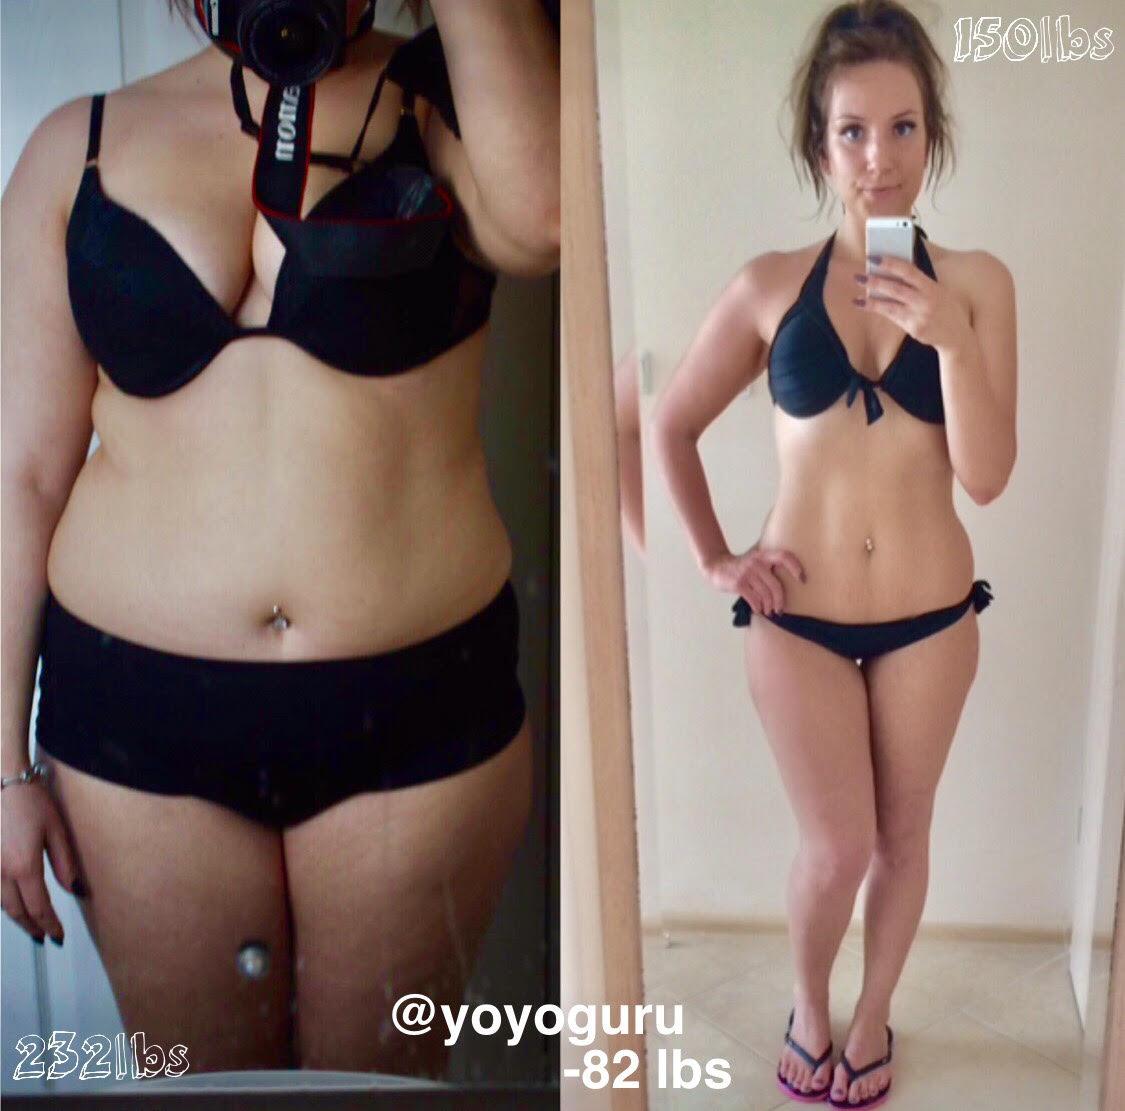 yoyoguru-fitness